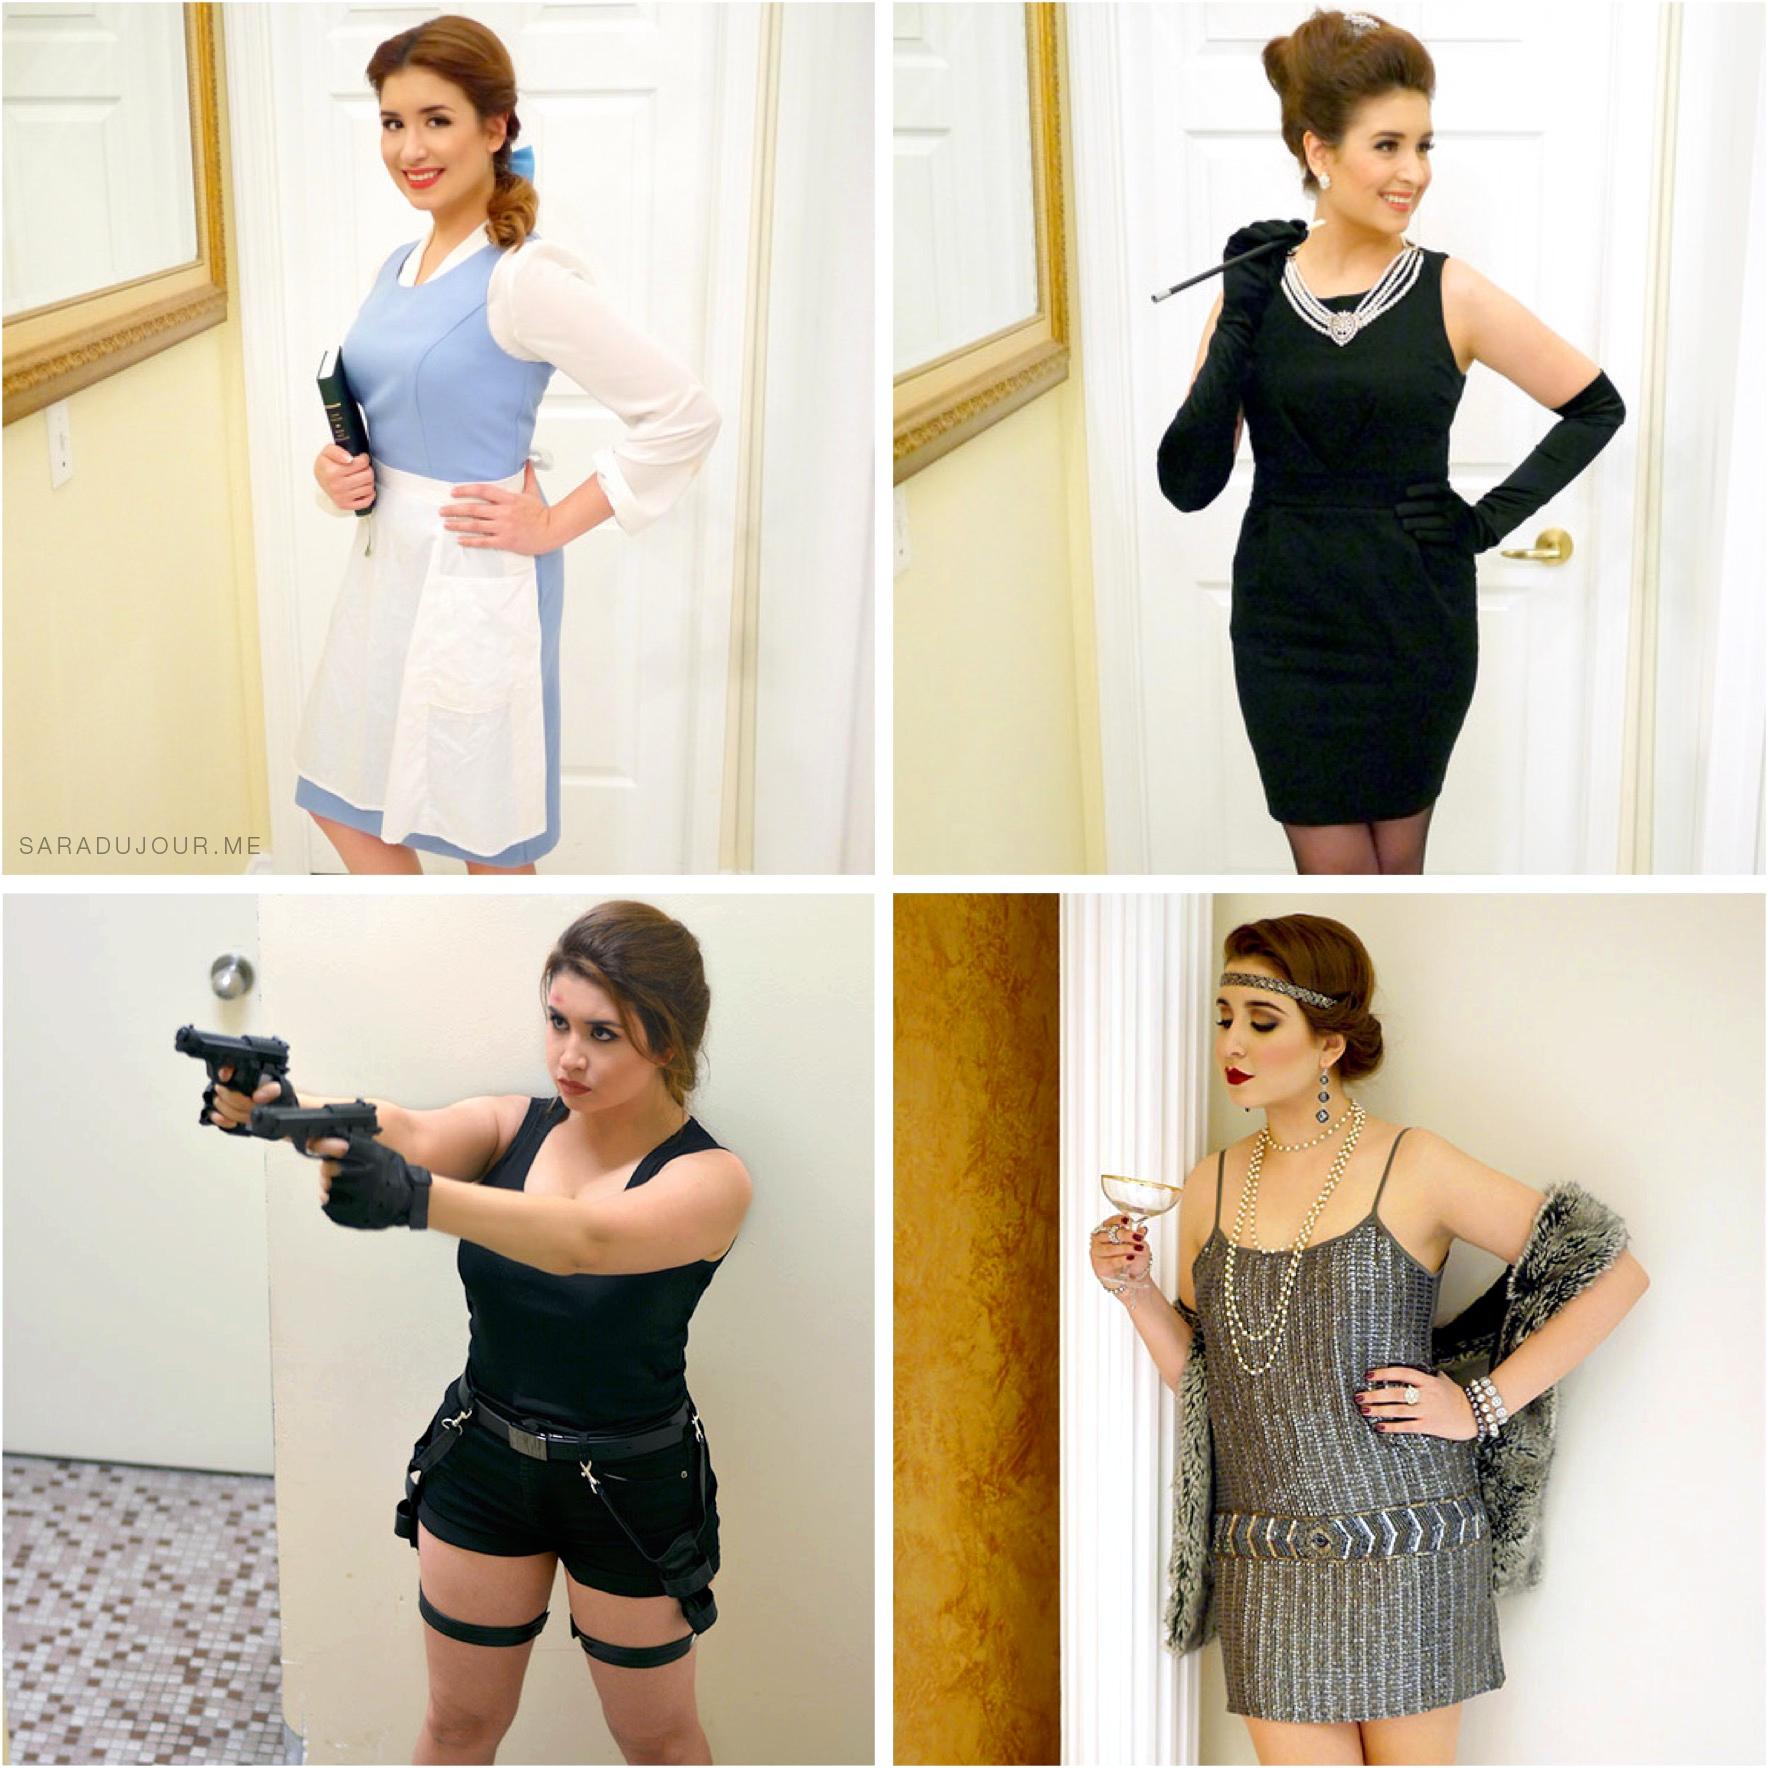 10 Amazing Last Minute Homemade Costume Ideas